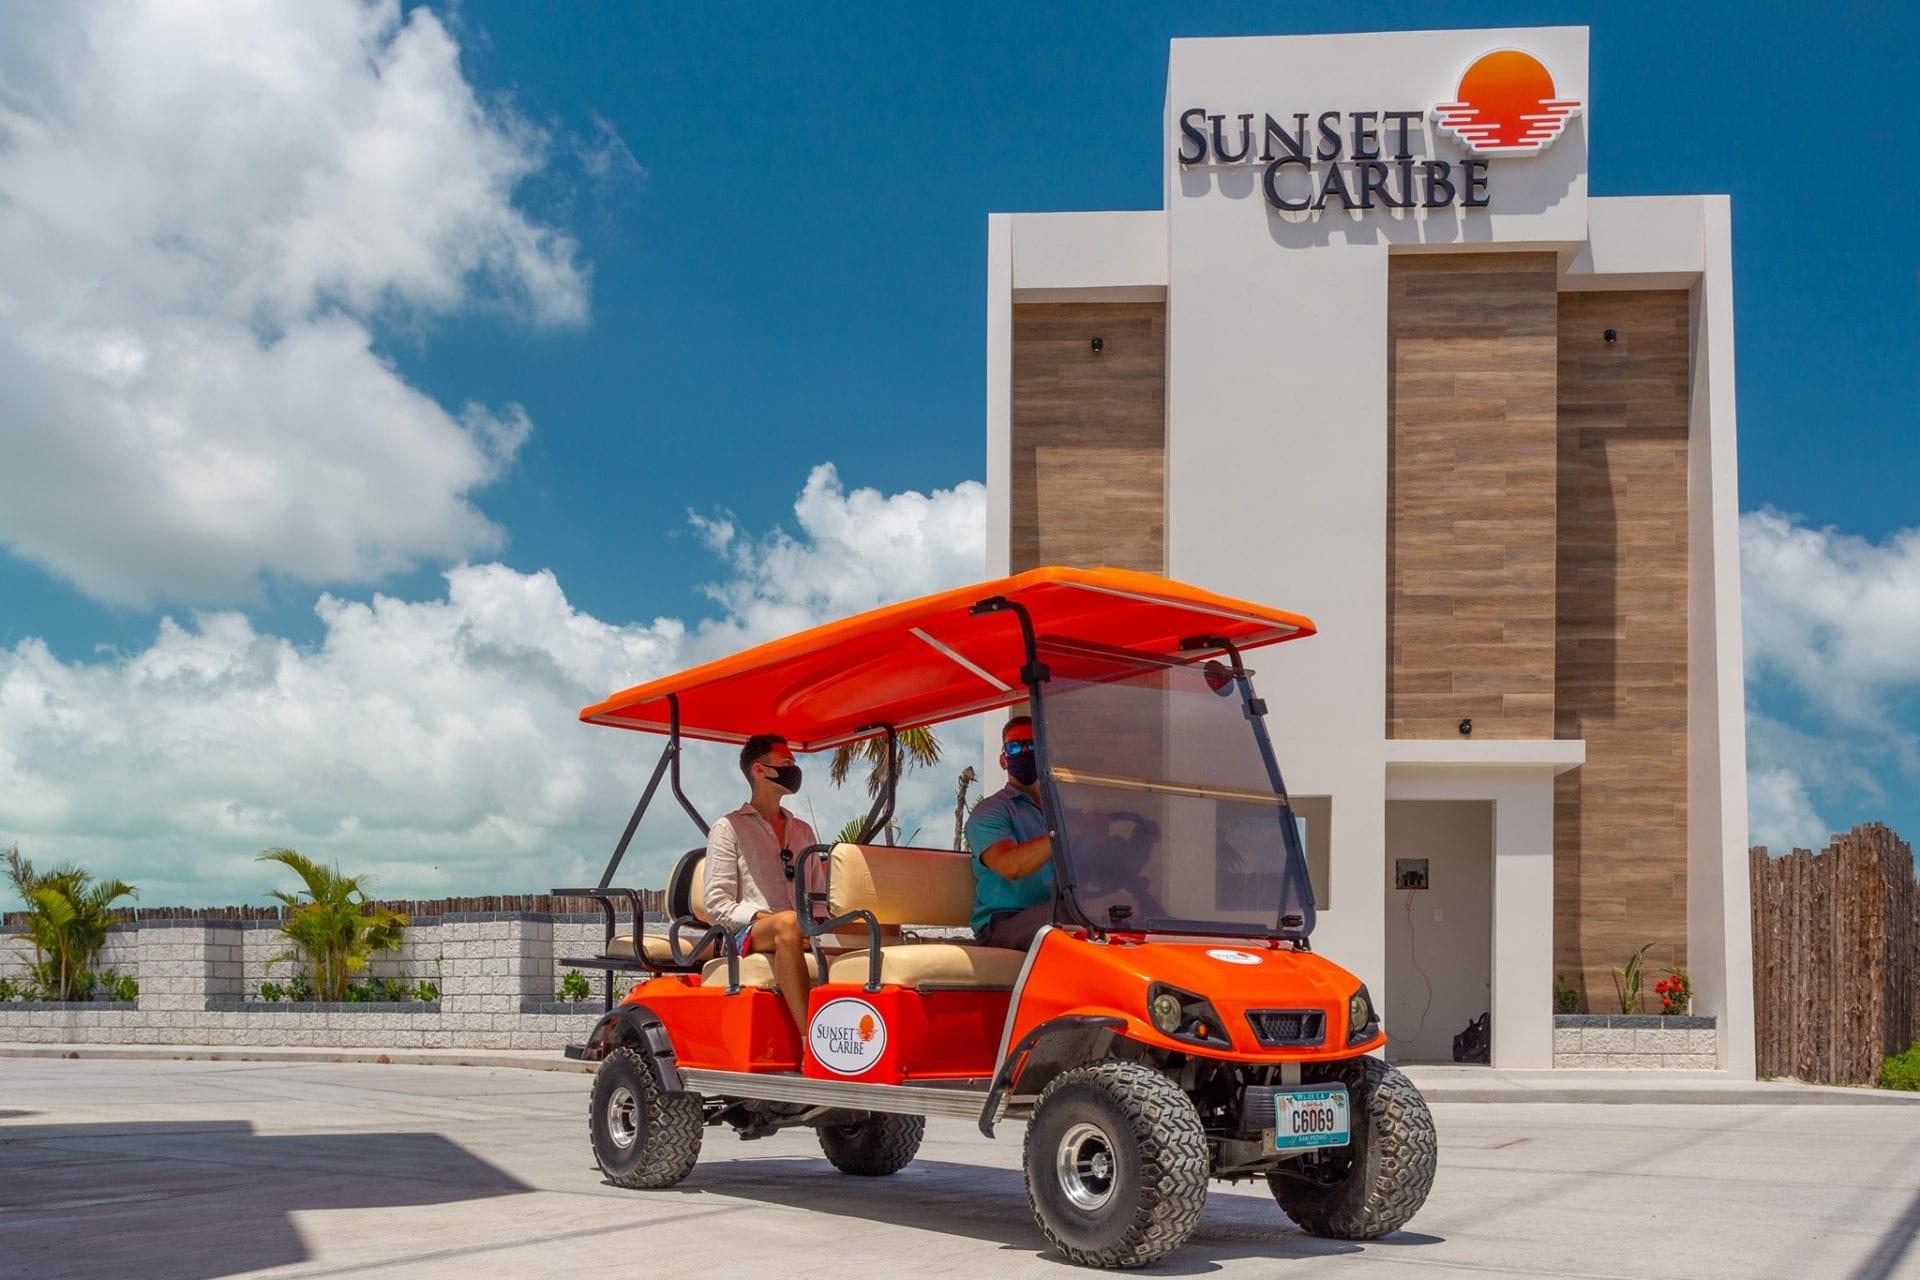 golf-carts-face-masks-belize-sunset-caribe-san-pedro-ambergris-caye